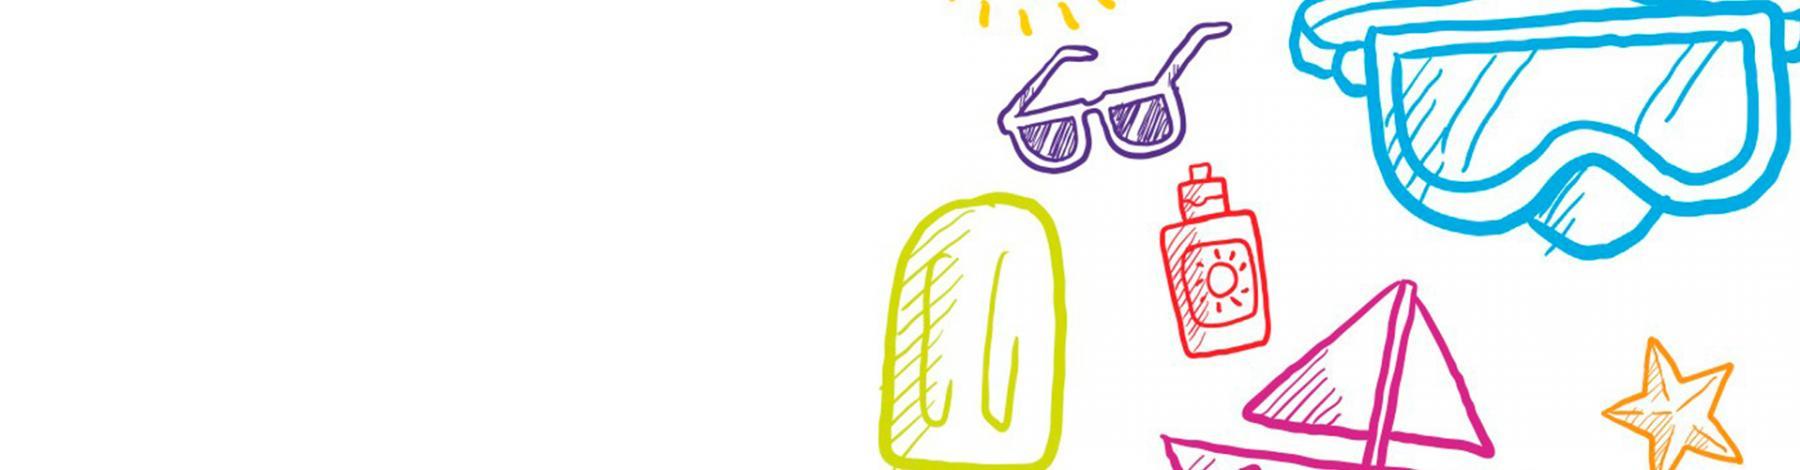 Neustart Schule Ferienpaket - Übergabe an Bundesministerin Hammerschmid